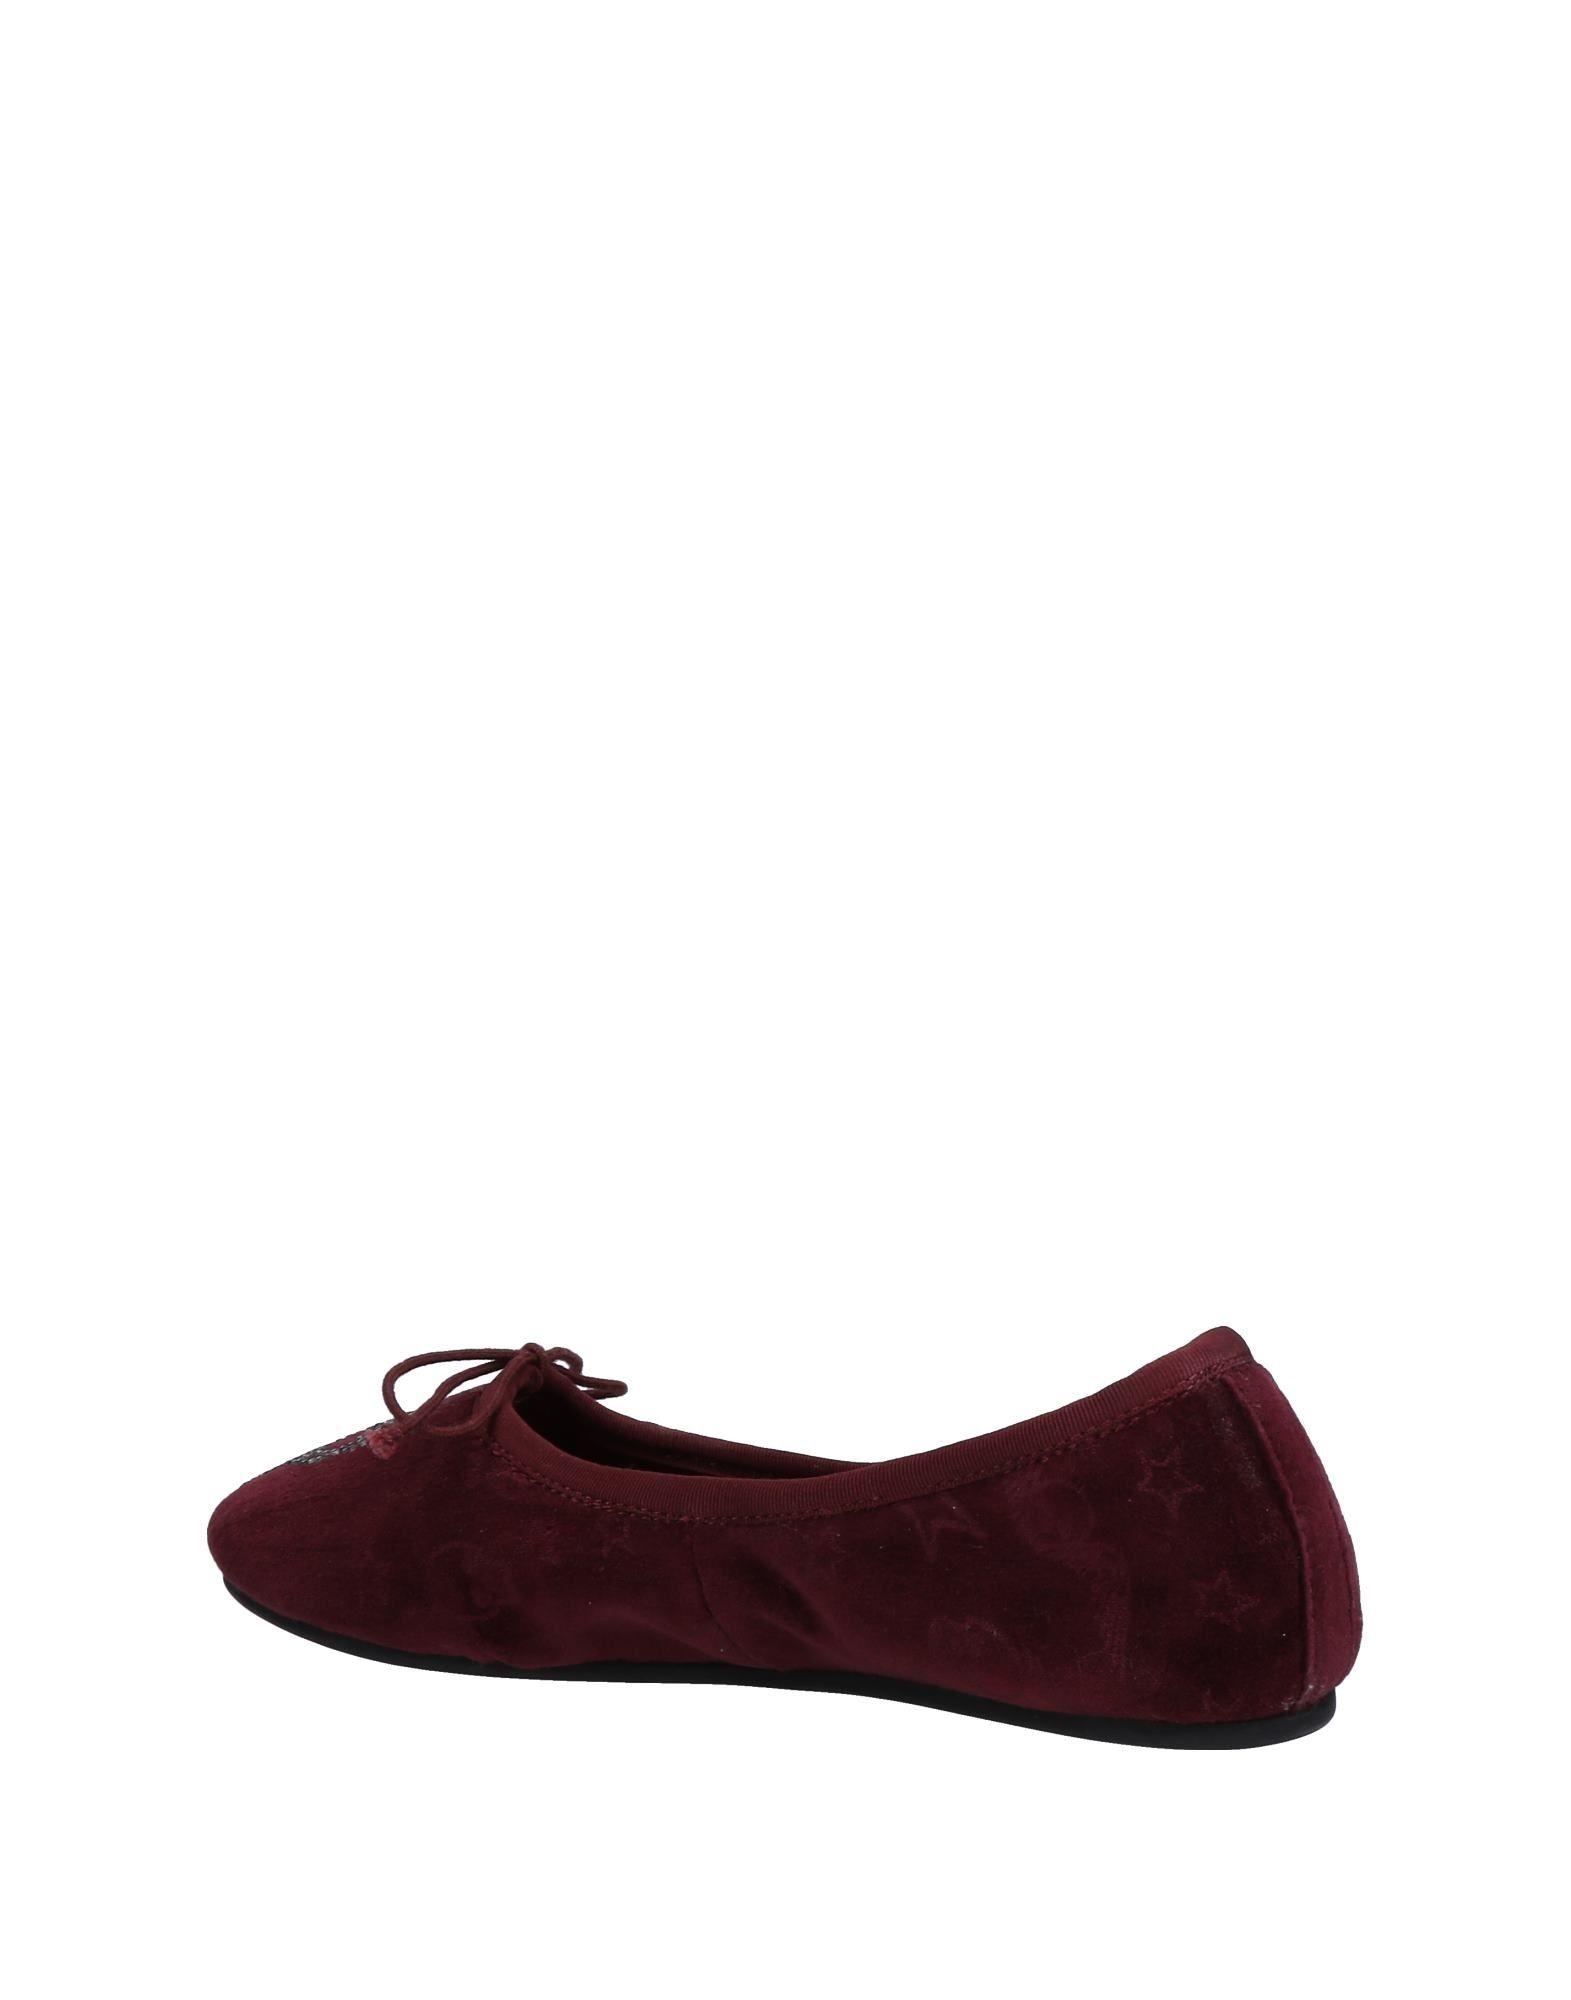 Ash Ballerinas Damen  11512357RC Schuhe Gute Qualität beliebte Schuhe 11512357RC 1931ab